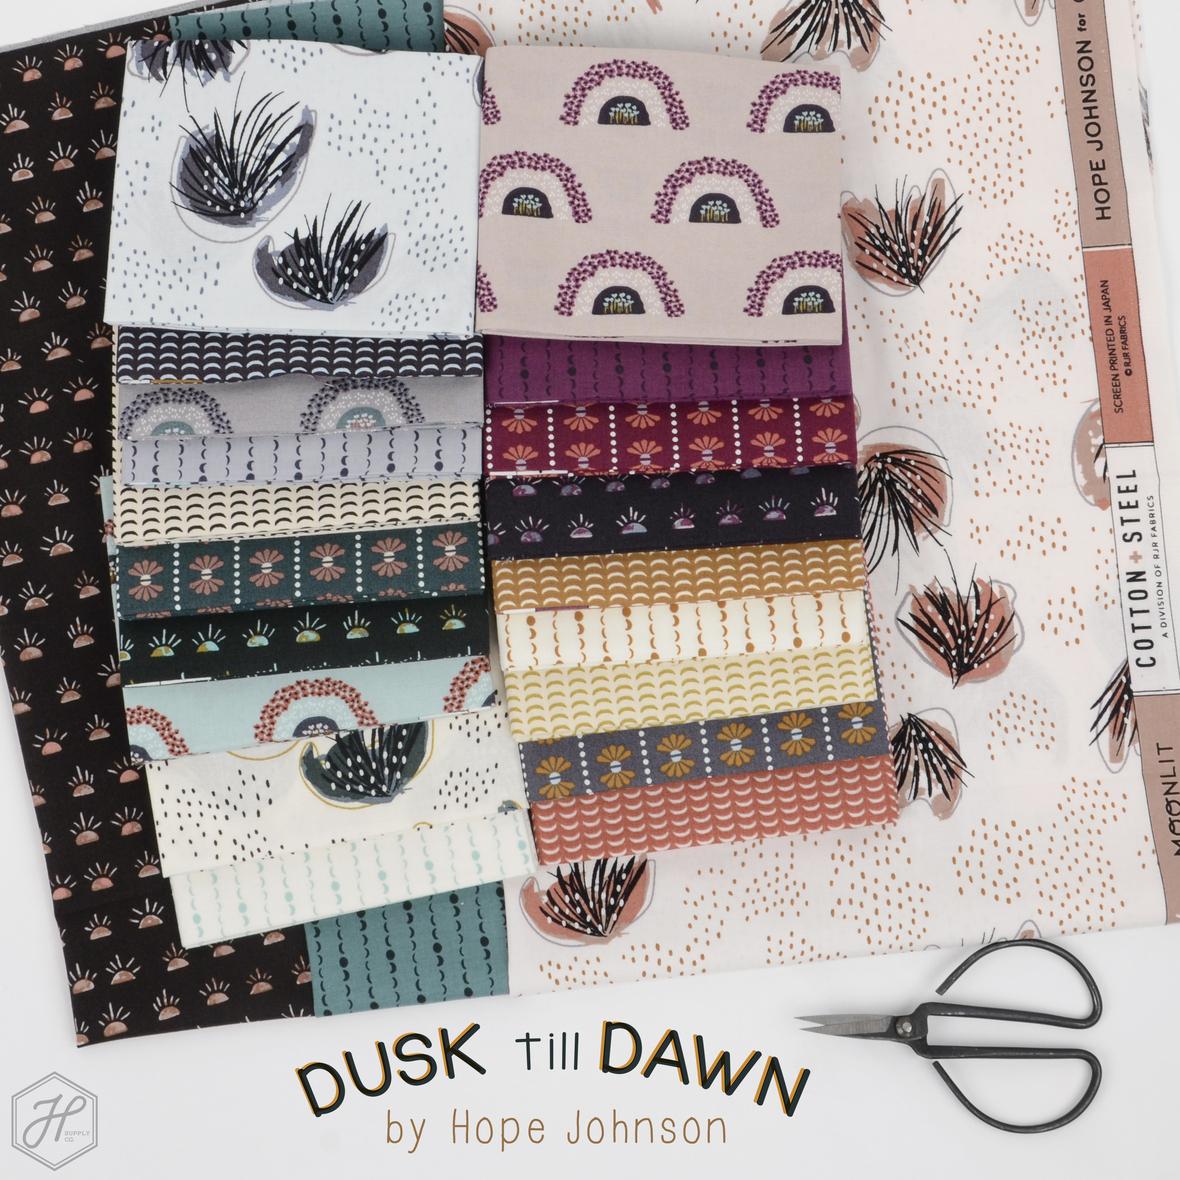 Dusk til Dawn by Hope Johnson fabric at Hawthorne Supply Co